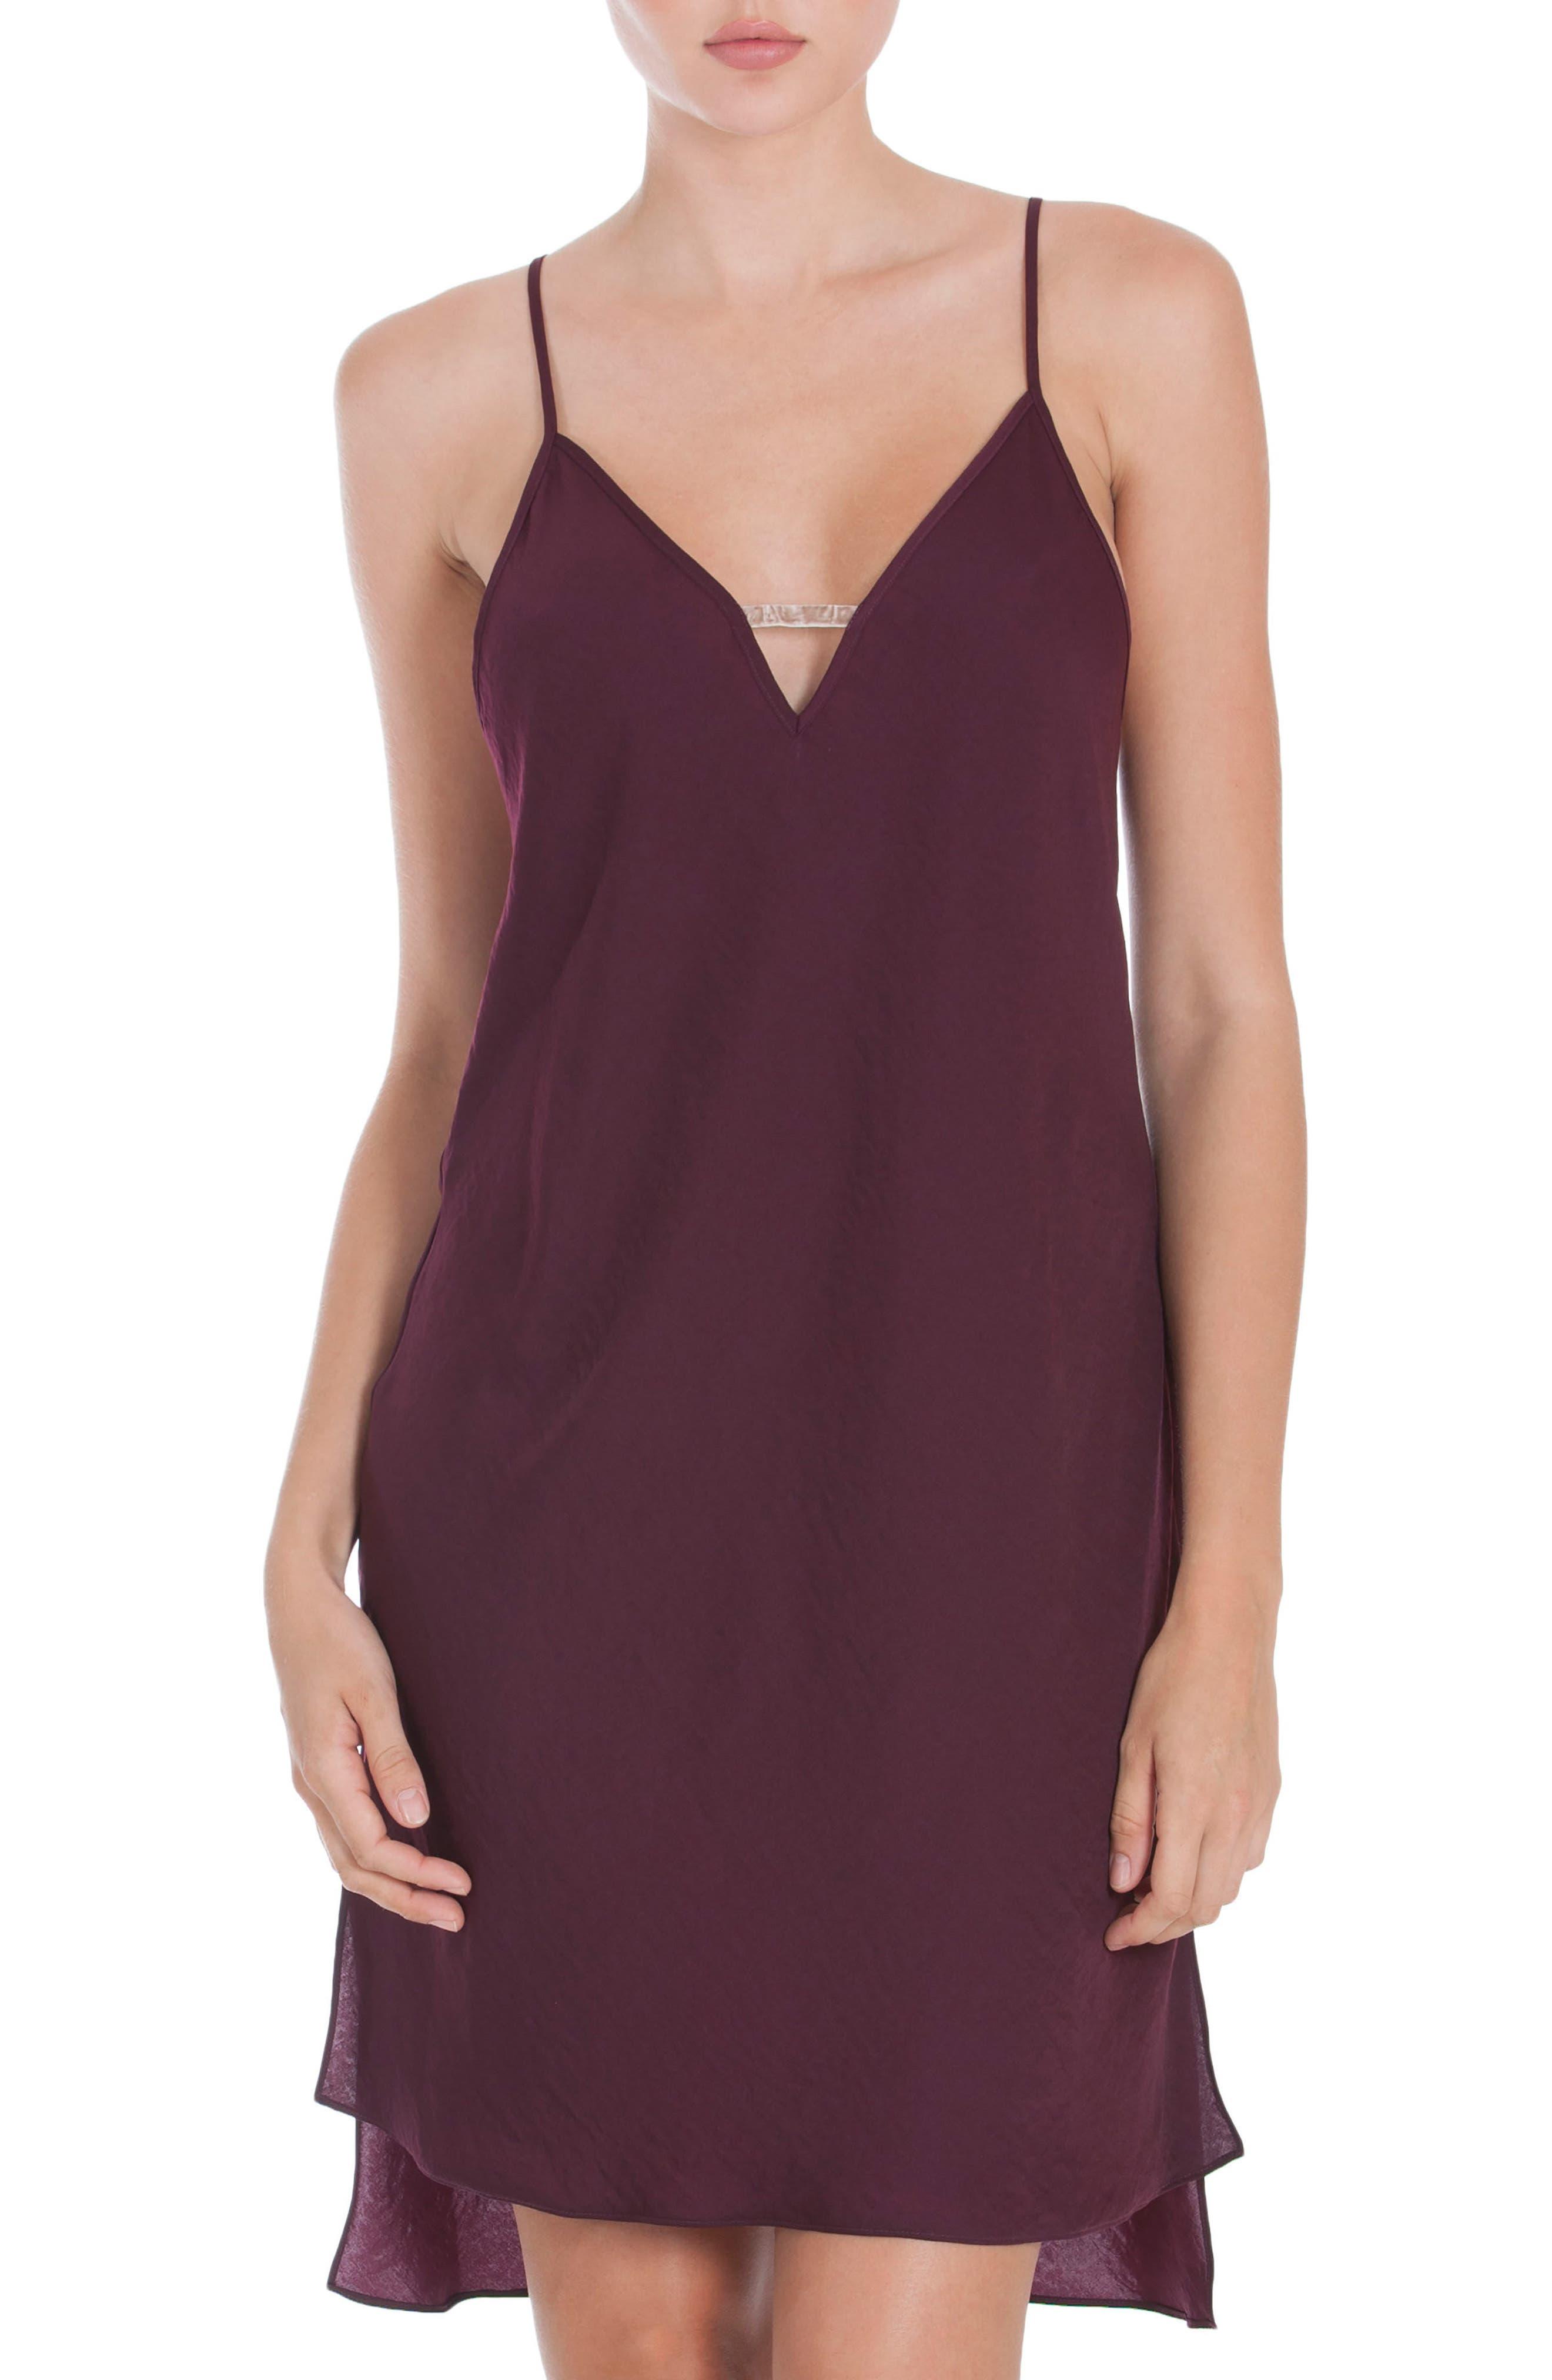 Satin Nightgown,                         Main,                         color, Wine